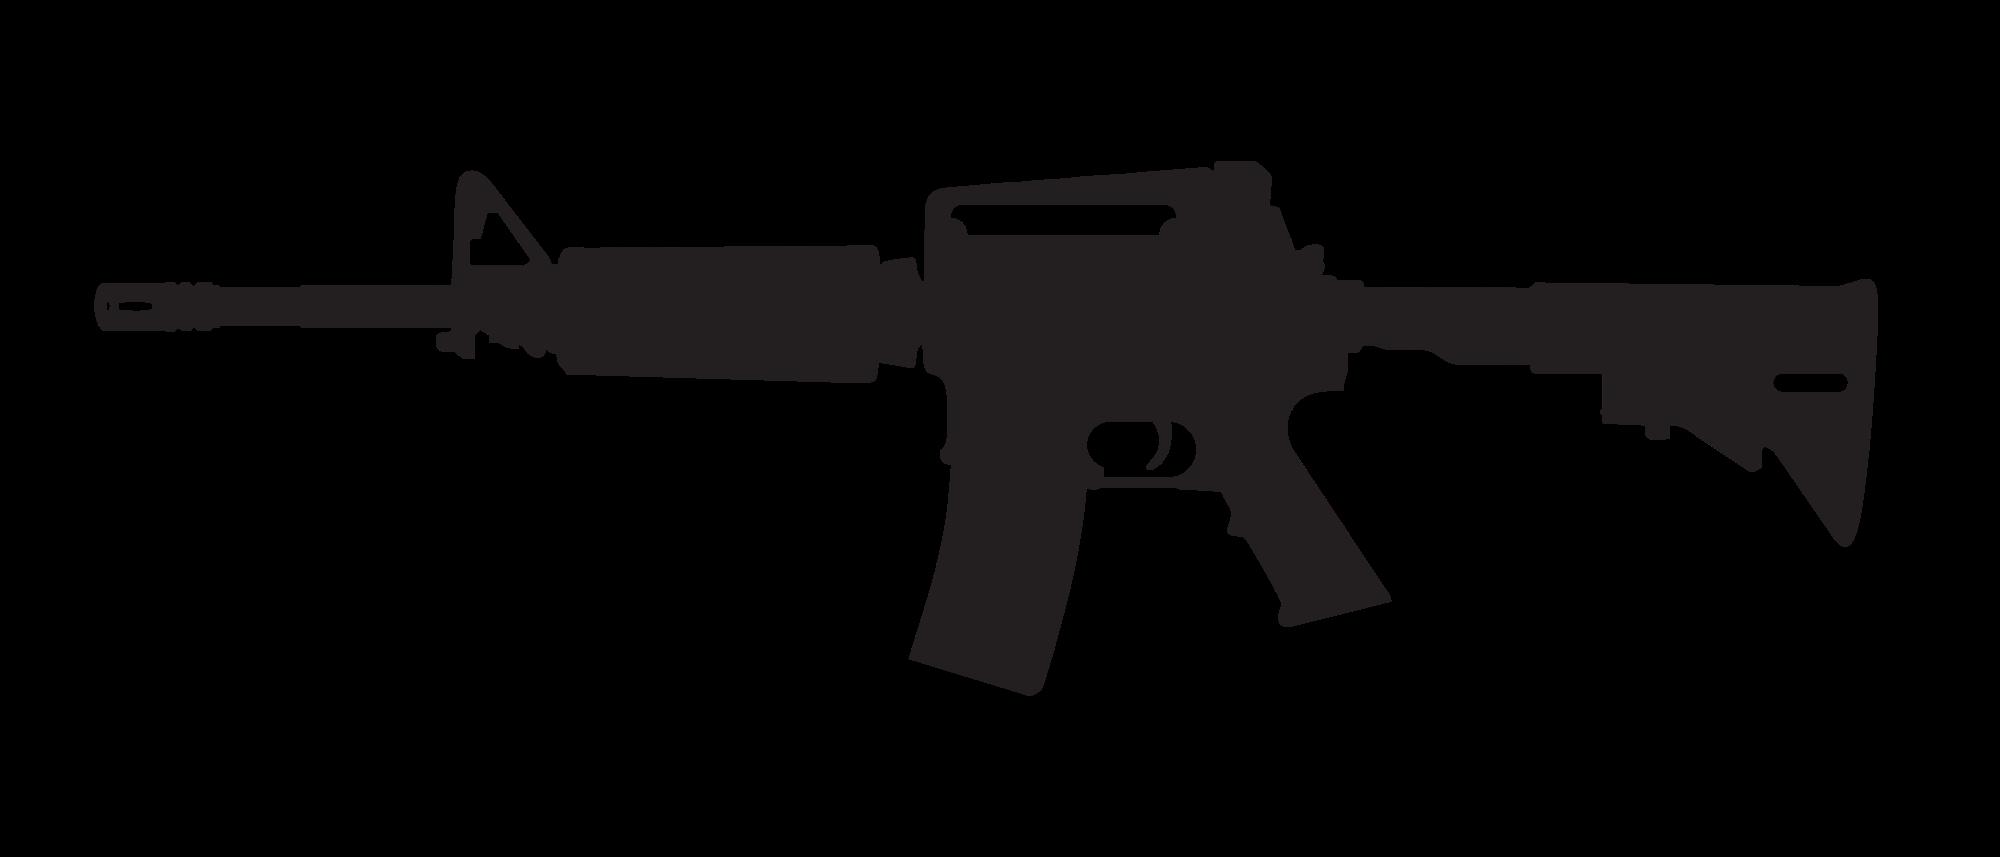 Clipart gun silhouette. Colt at getdrawings com